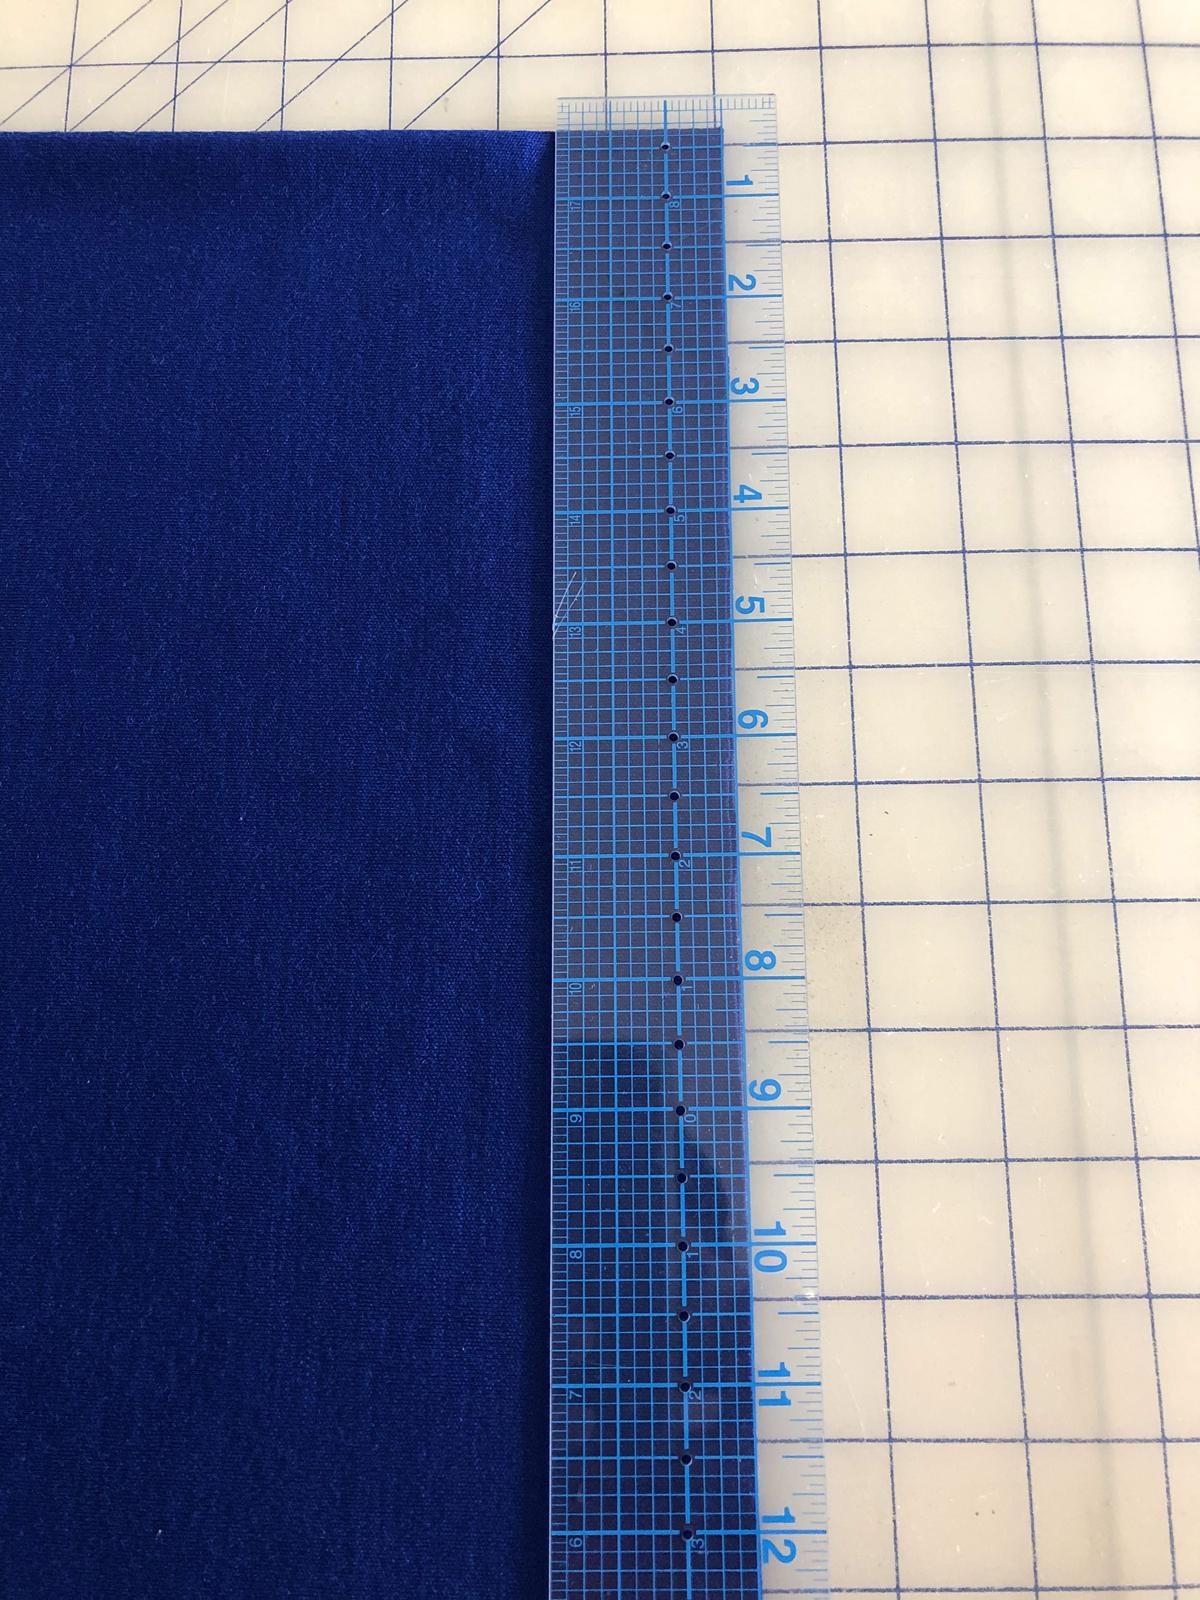 Measure the neck binding strip